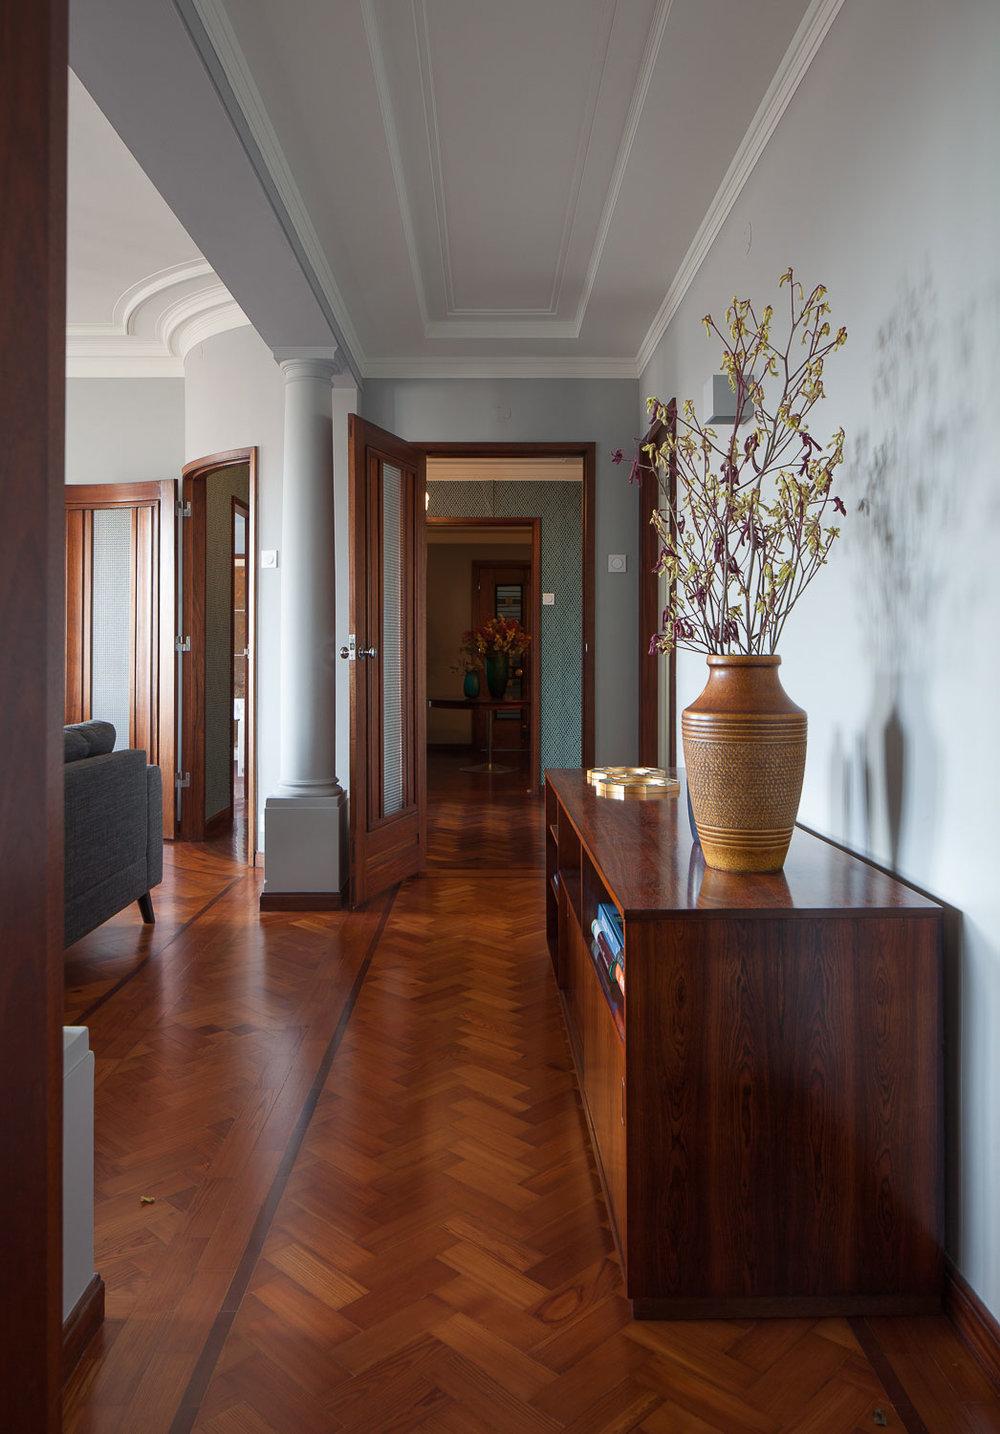 invitro-palacio-comercio1-foto06.jpg